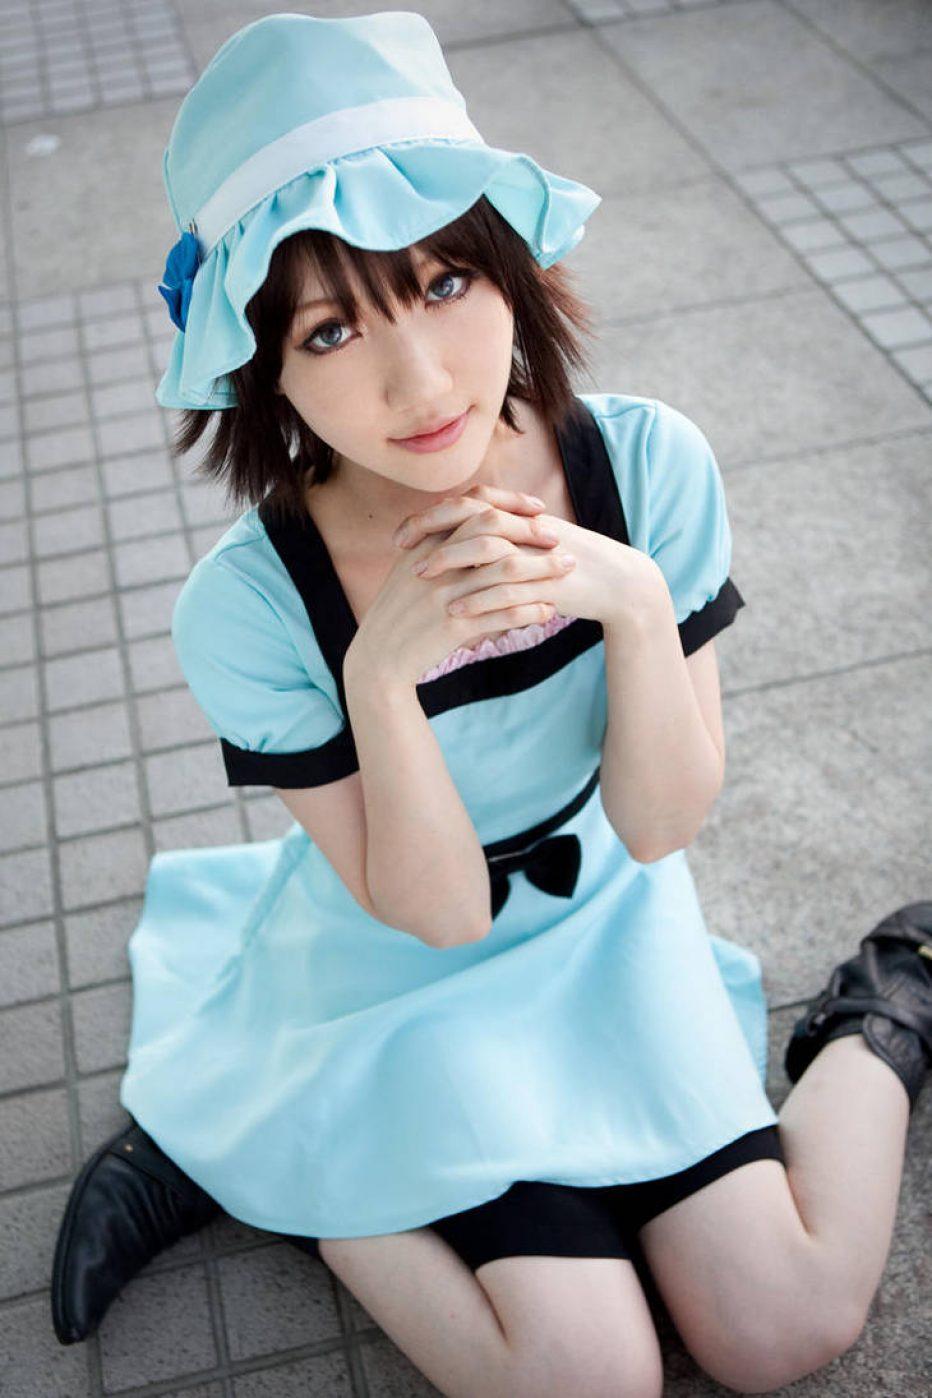 SteinsGate-Shiina-Mayuri-Cosplay-Gamers-Heroes-7.jpg